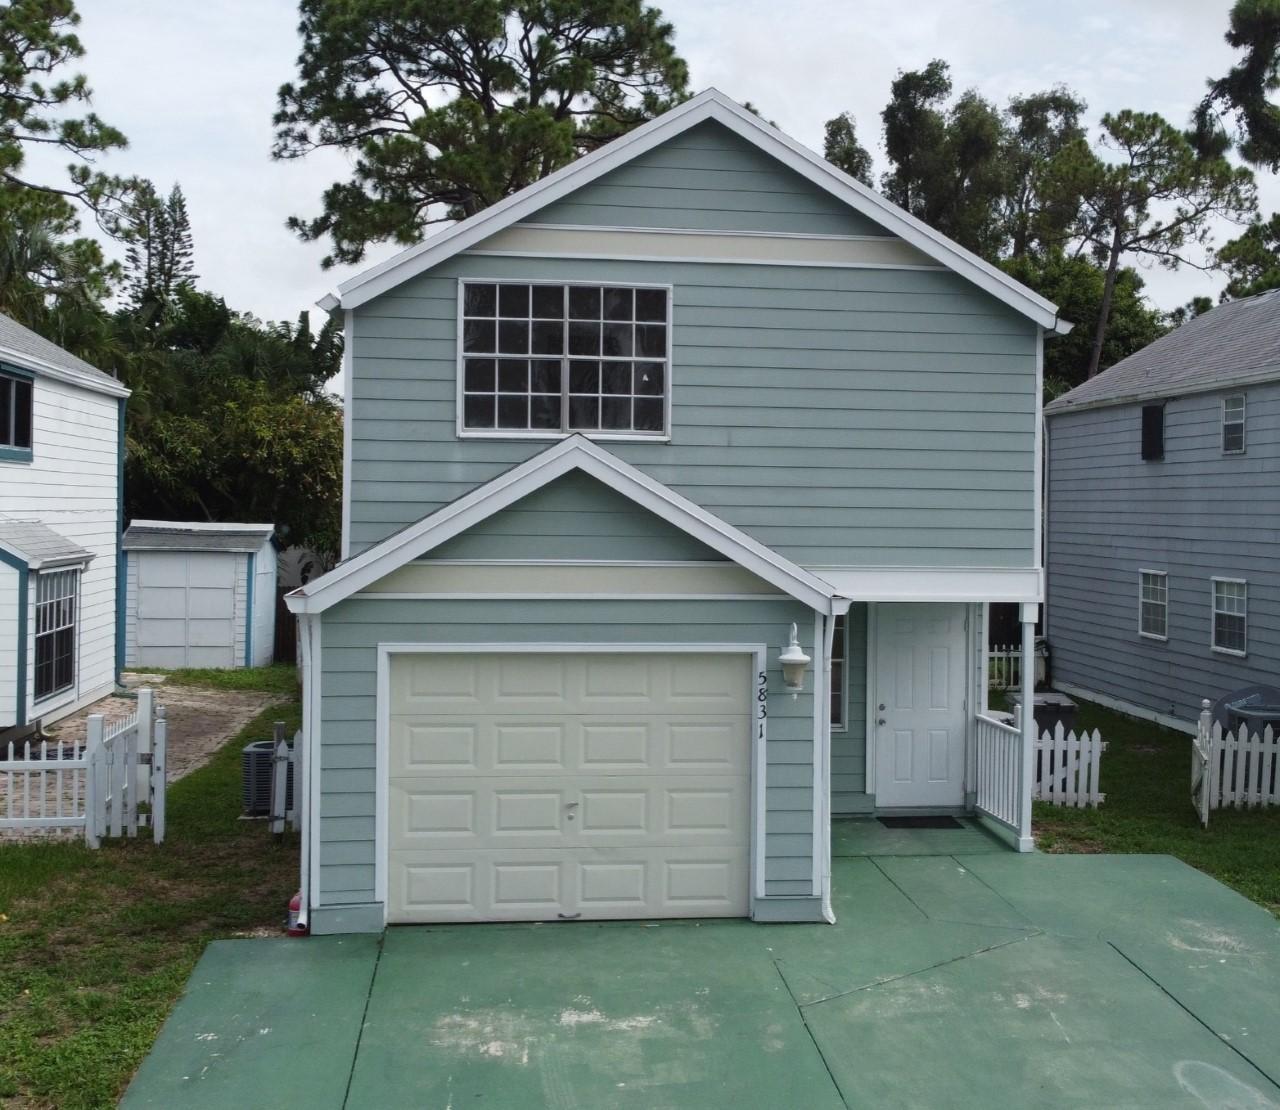 5831  Thisledown Court  For Sale 10725331, FL